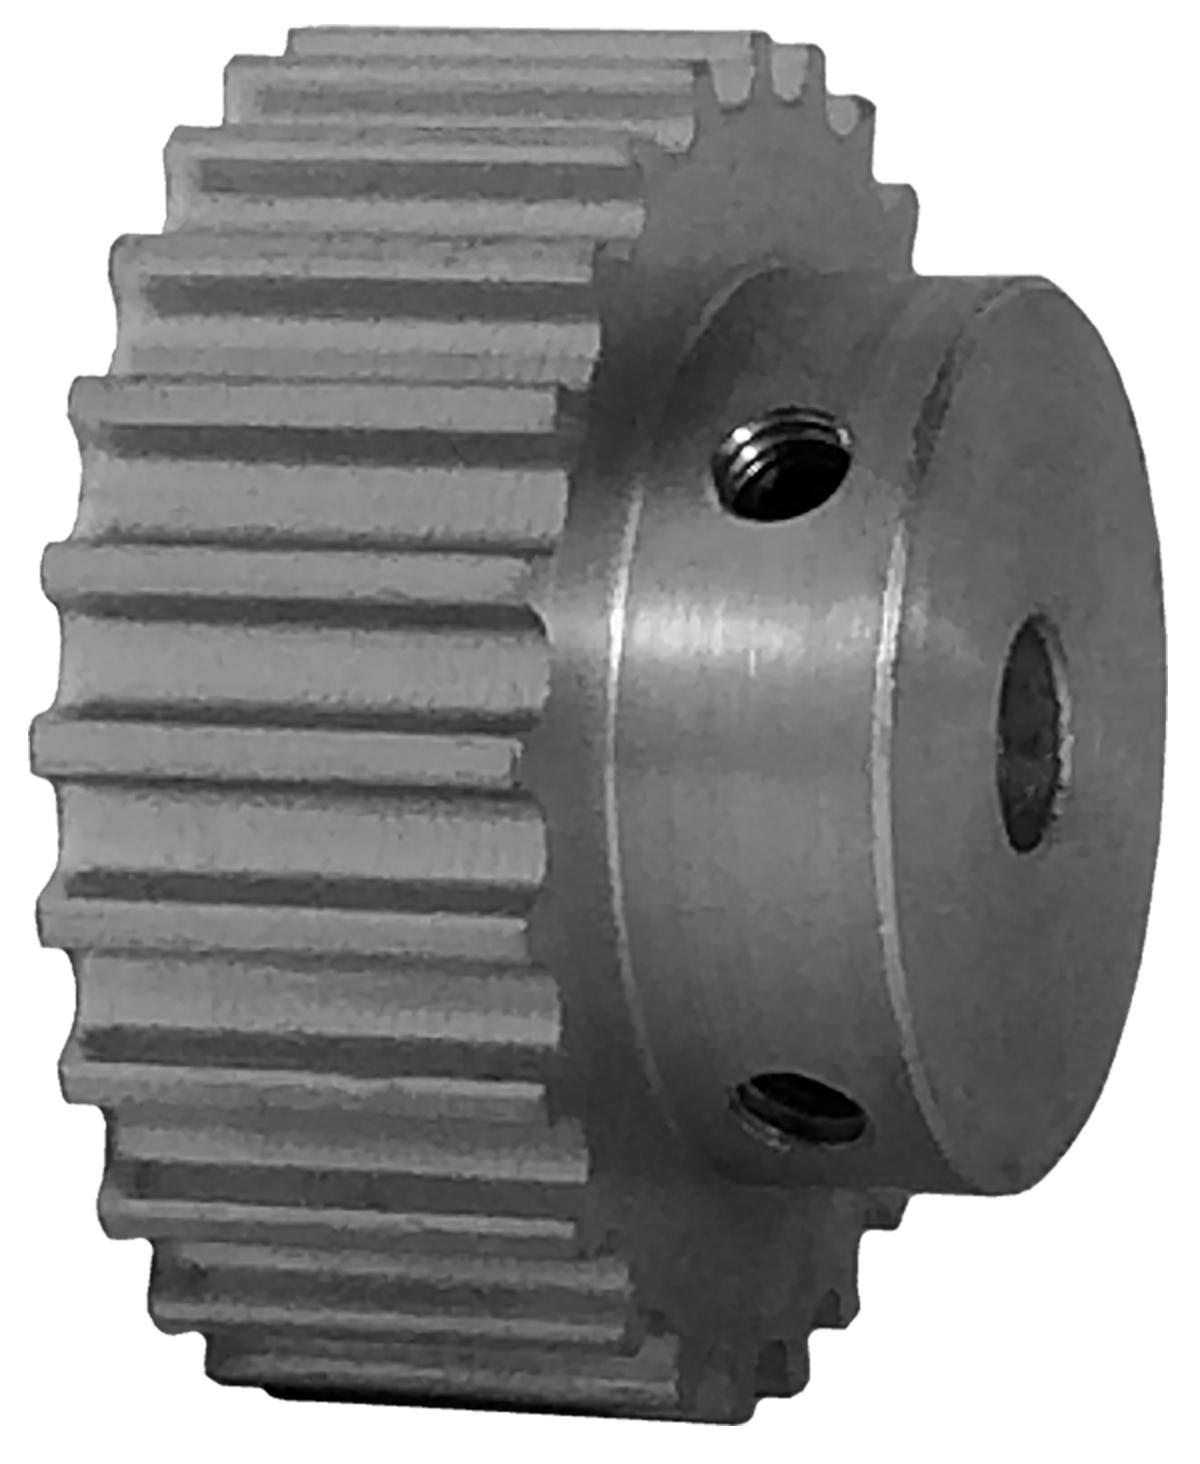 25-5M09-6A3 - Aluminum Powerhouse®HTD® Pulleys